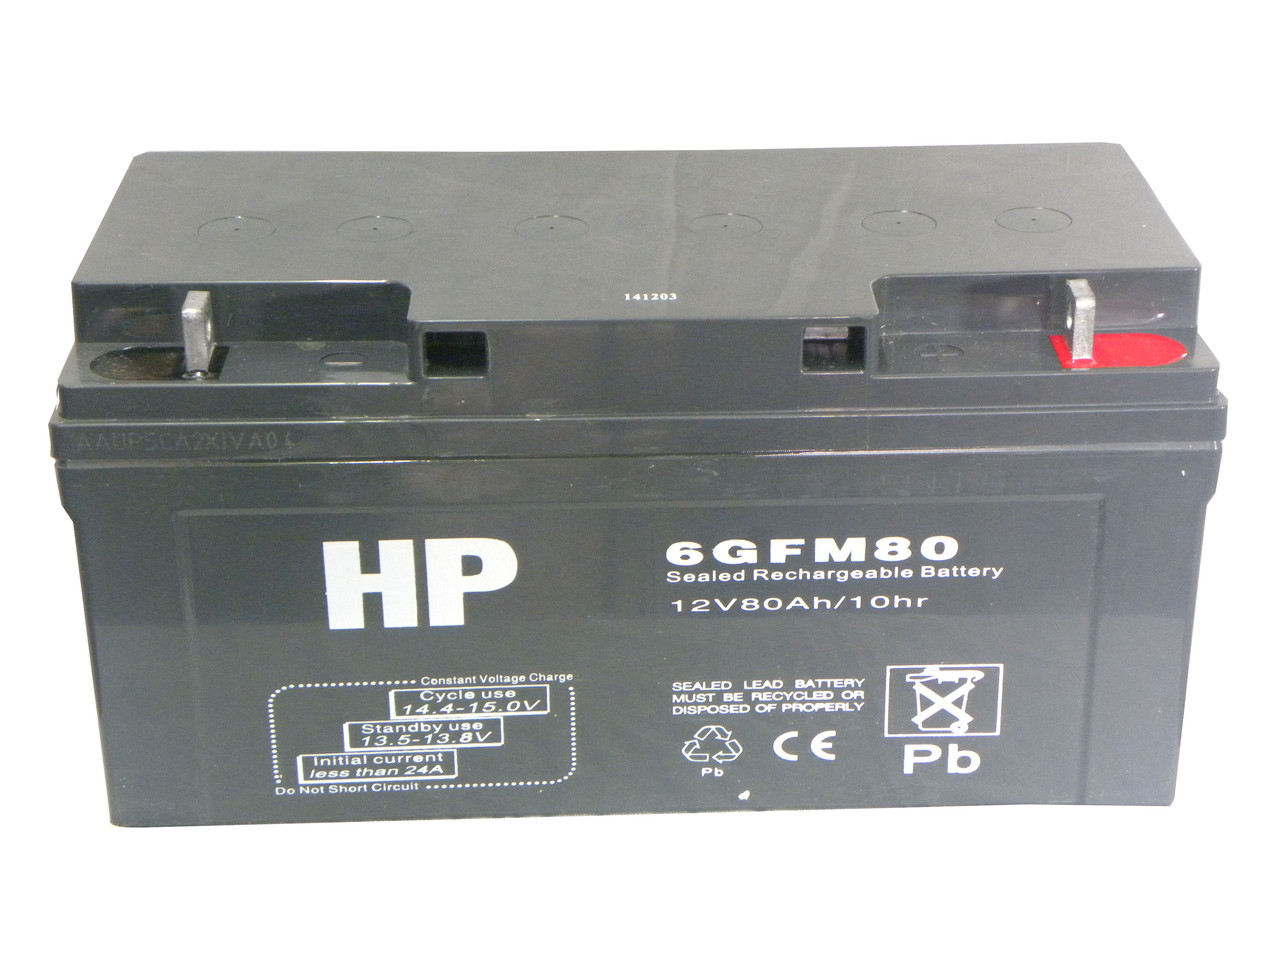 Аккумулятор на UPS 12V 80Ah/10HR